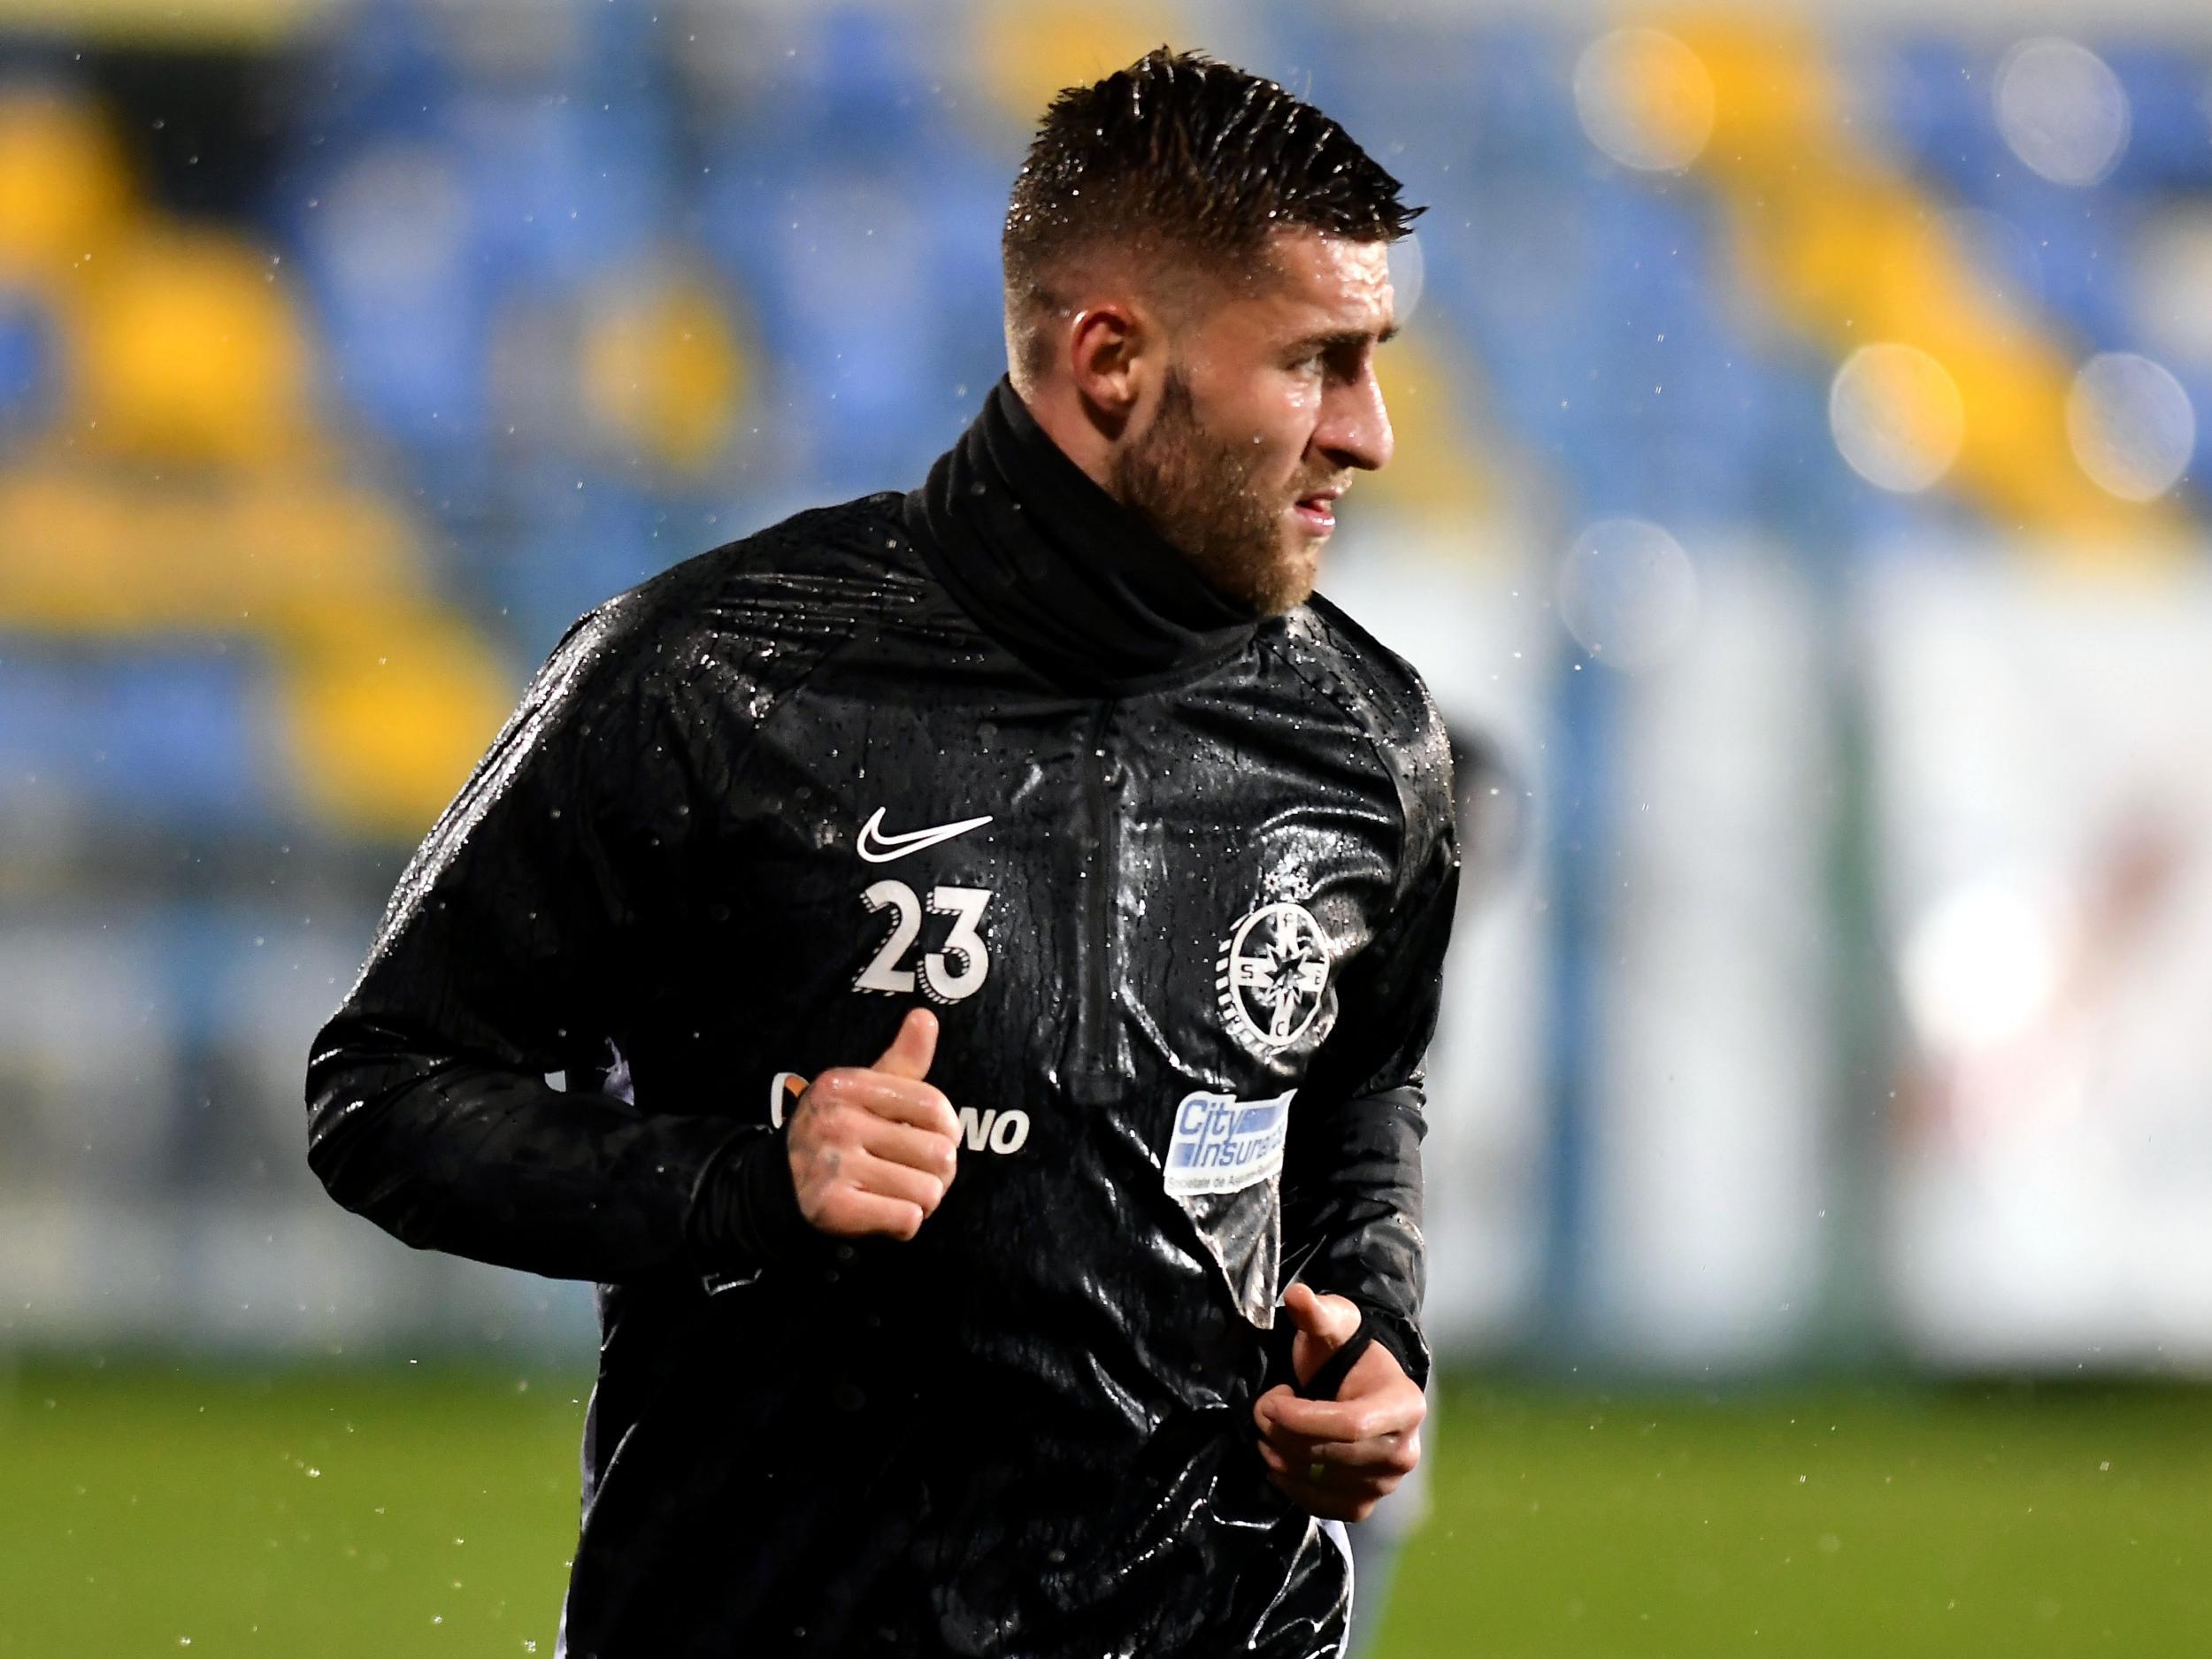 FC VOLUNTARI - FCSB - POSTPONED!